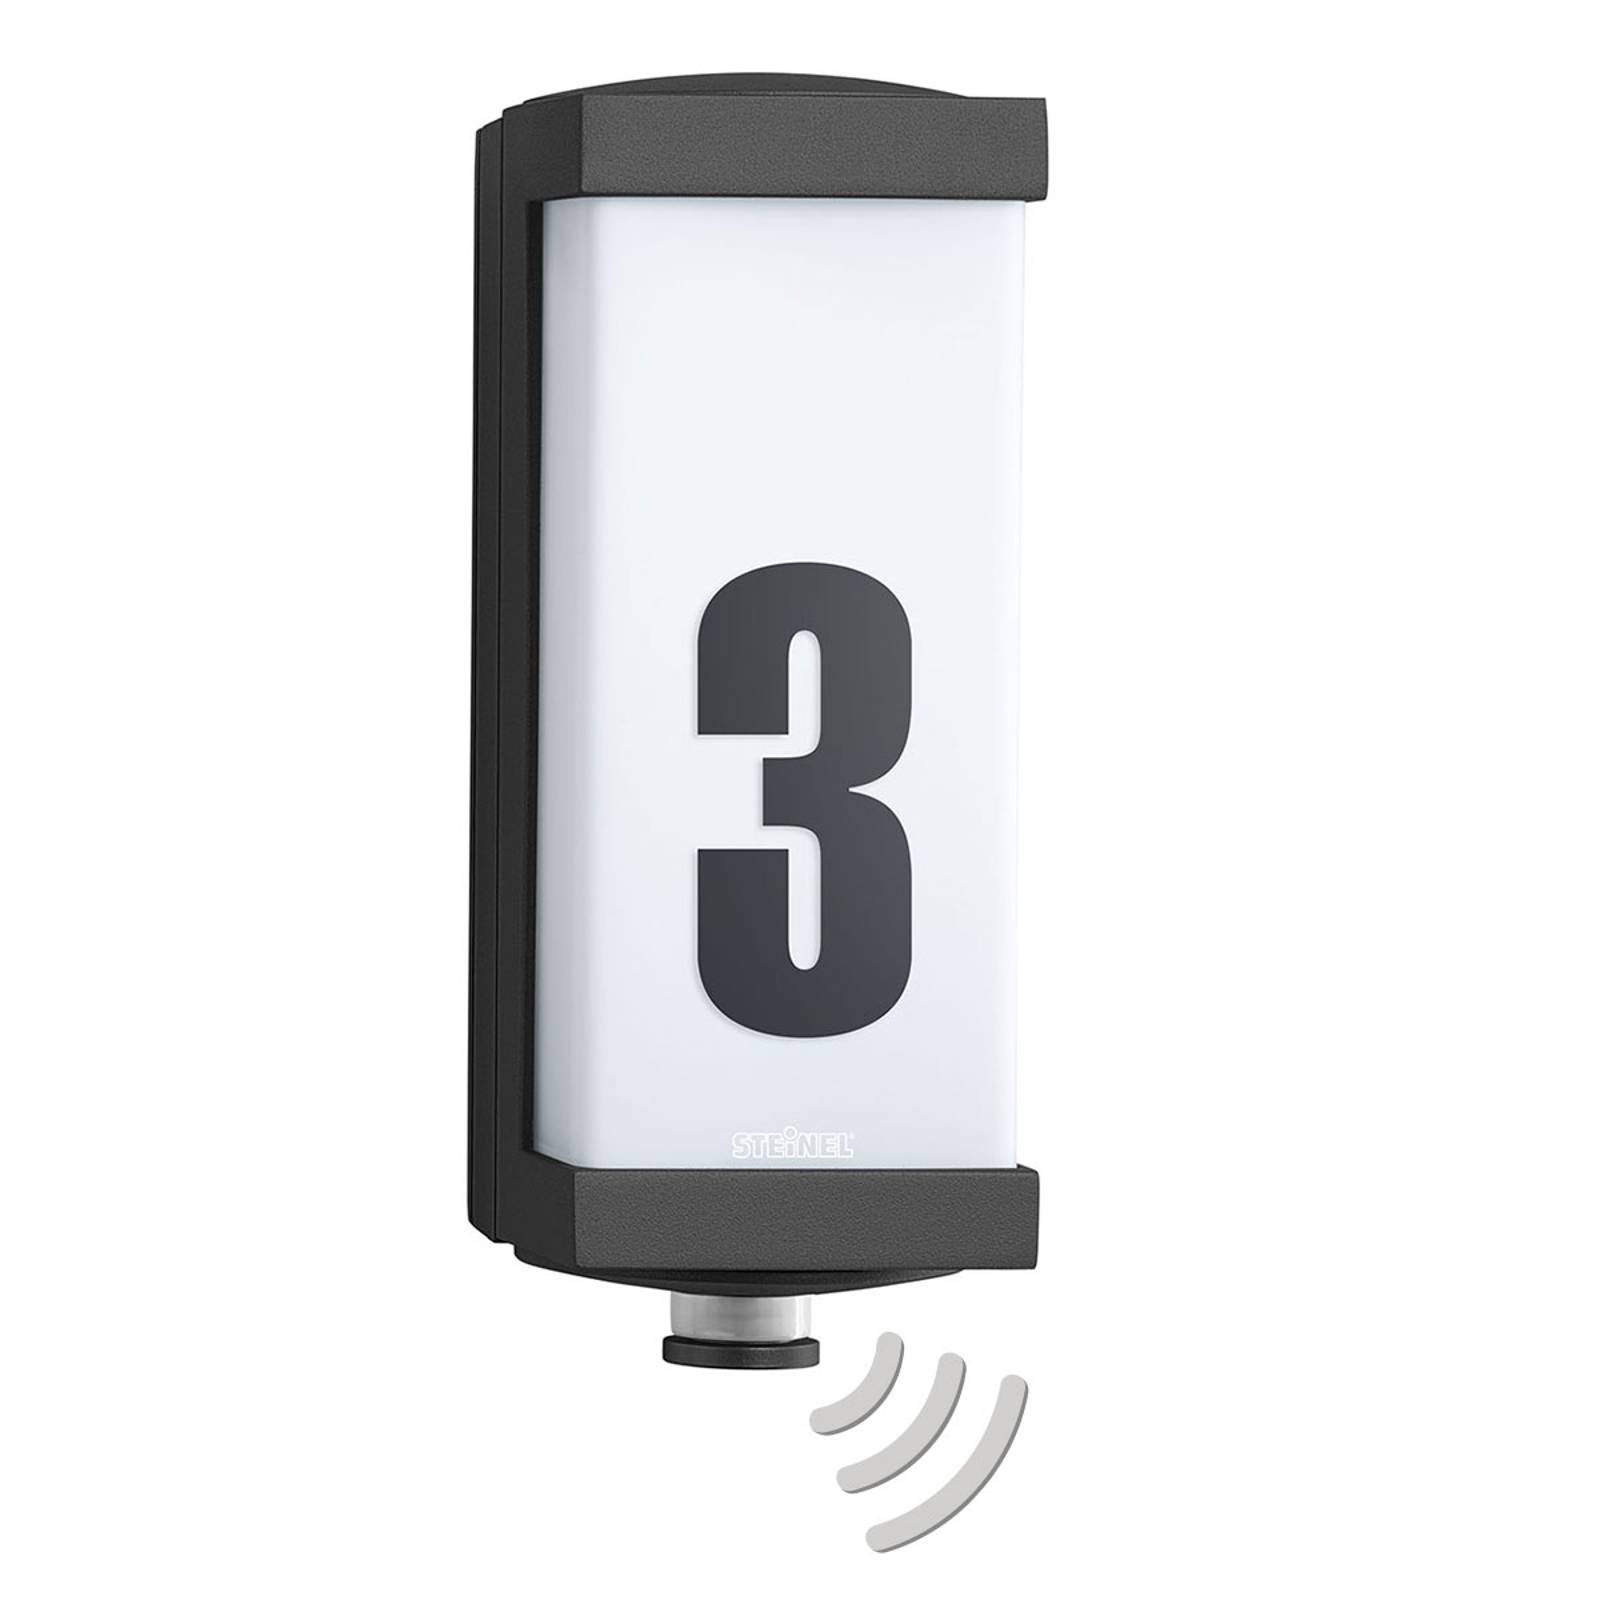 STEINEL L 666 V2 LED esterni nr. civico sensore